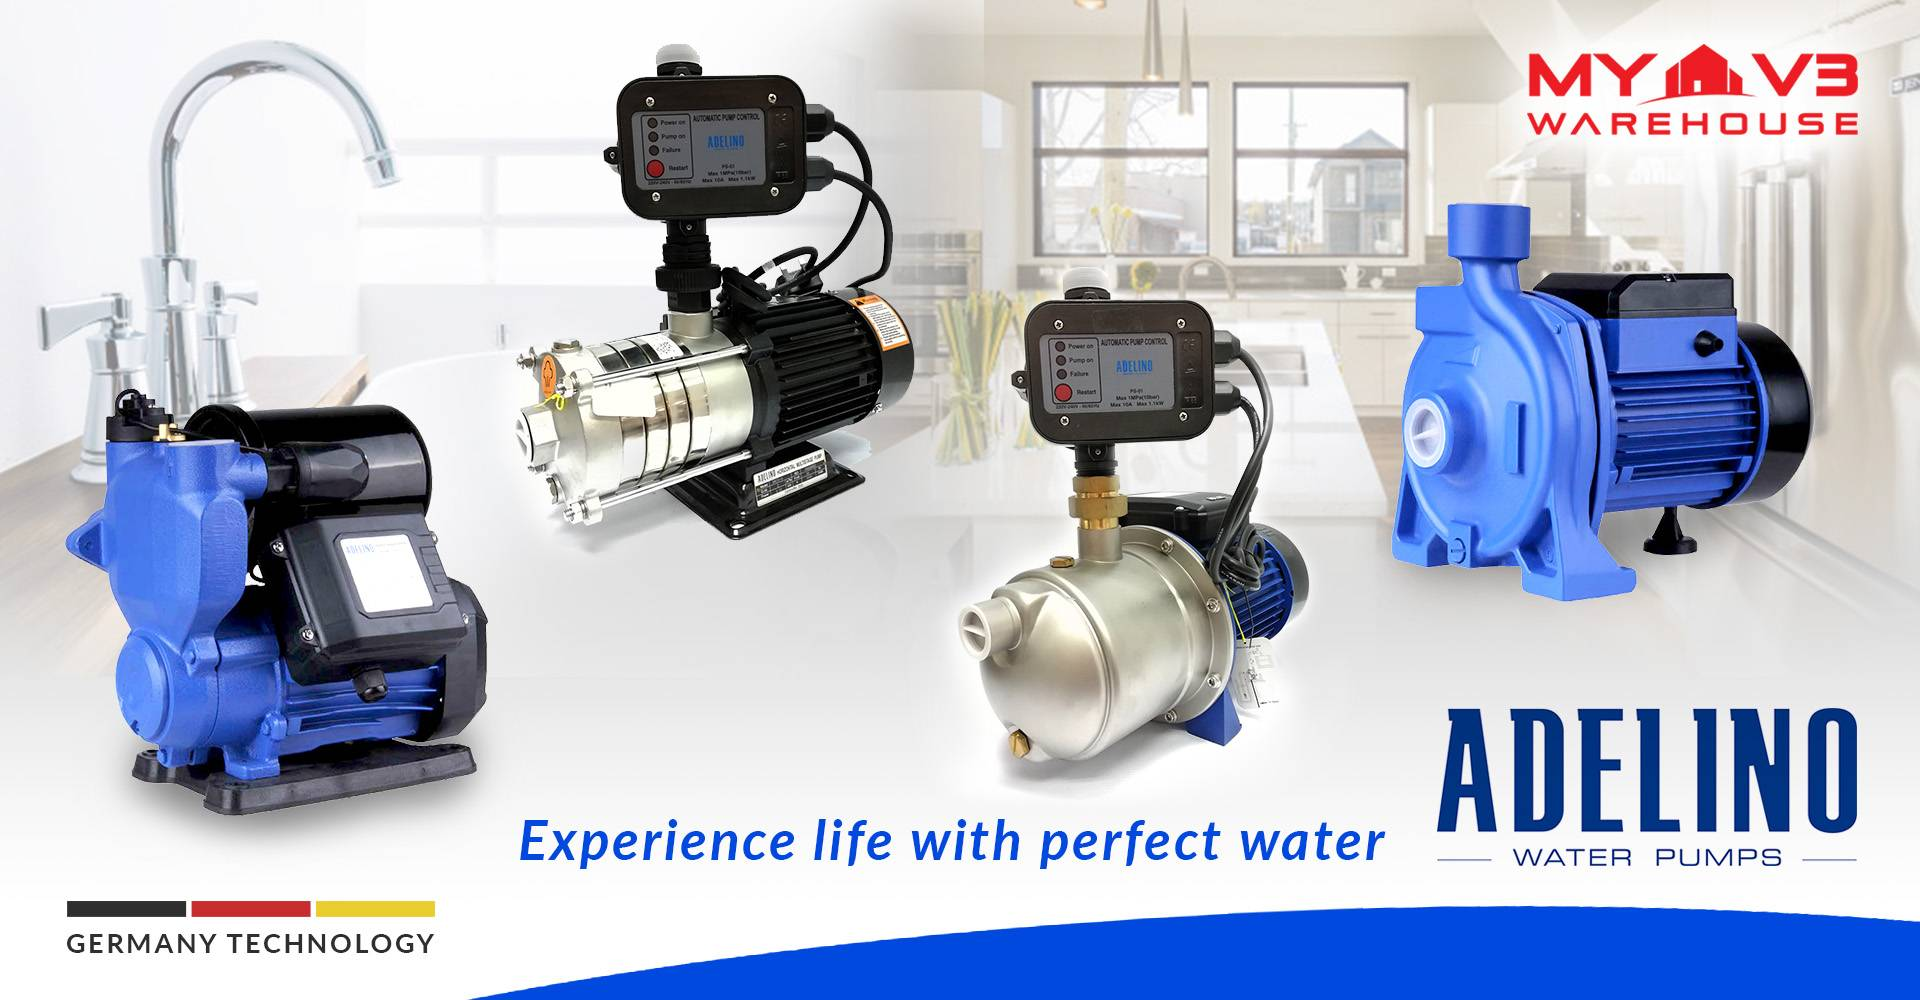 Adelino Water Pumps